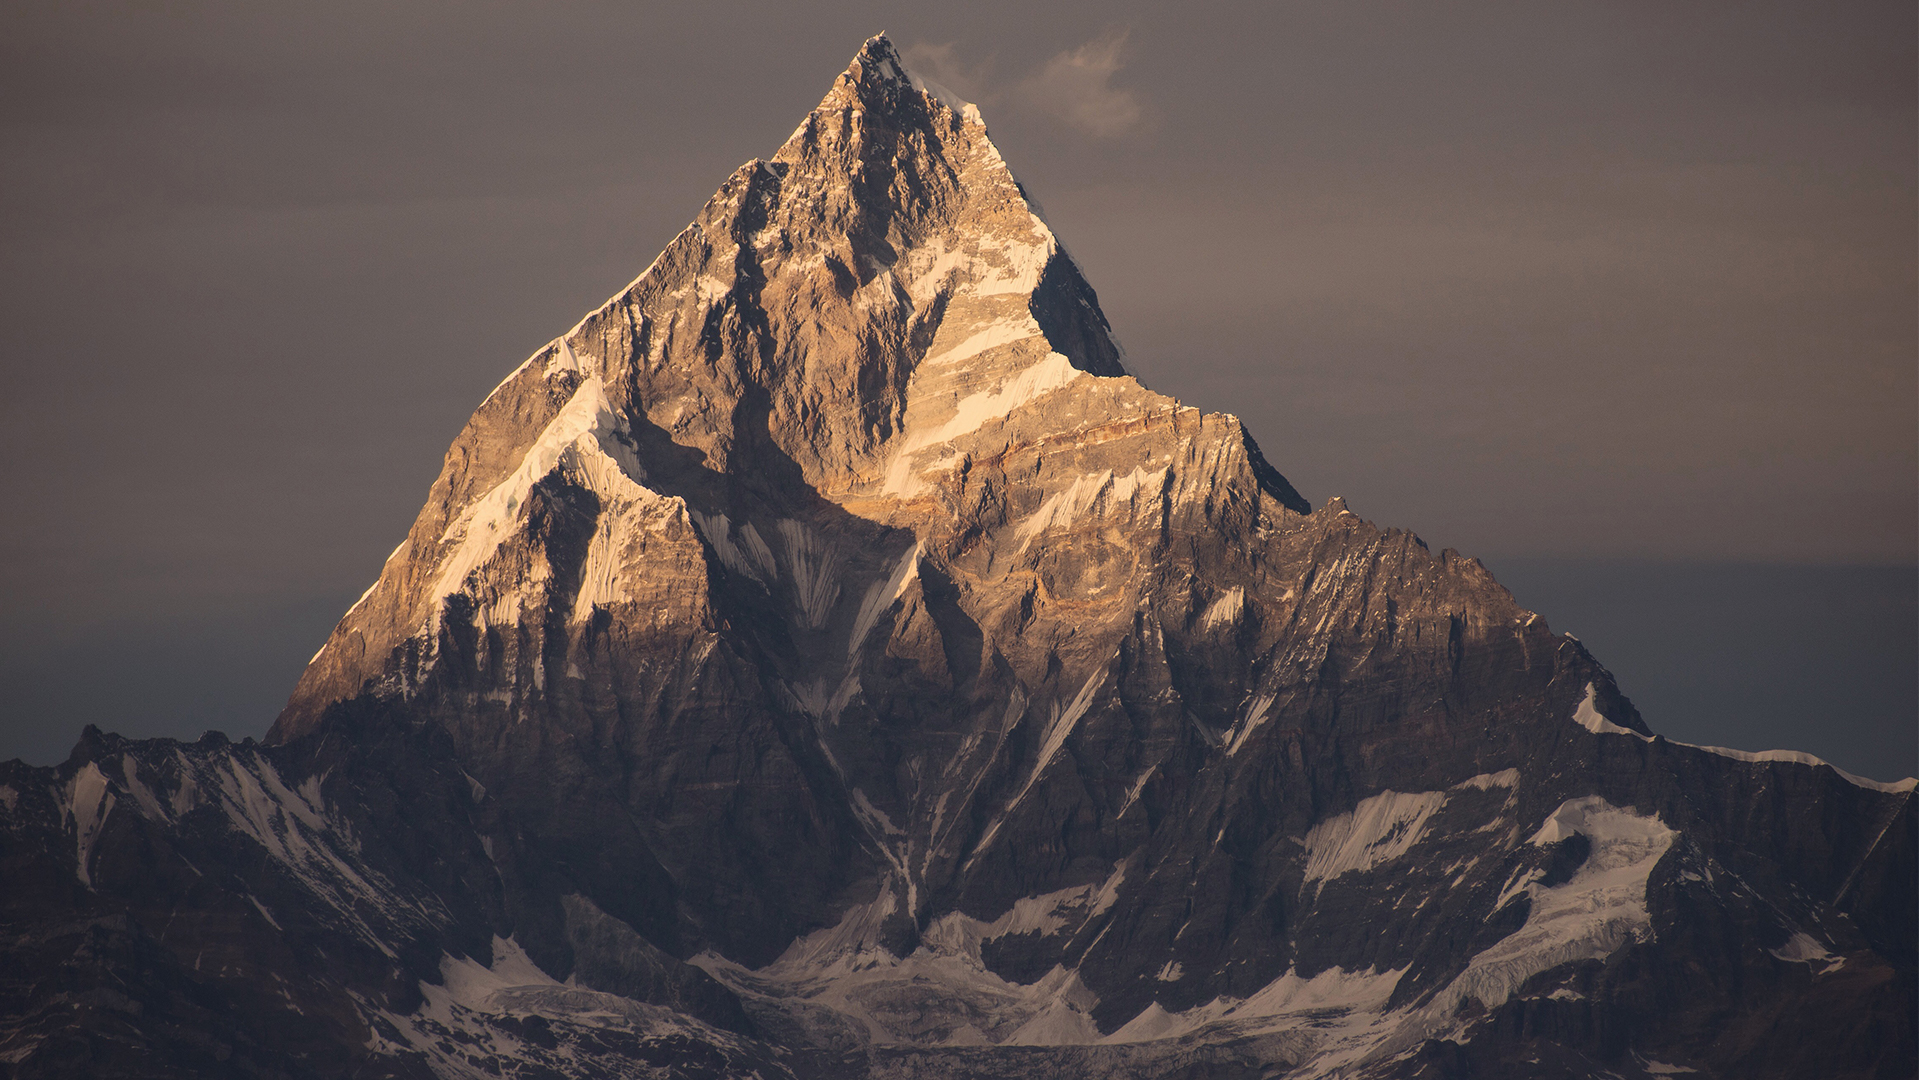 Choose to Challenge: Pushing Rocks Uphill